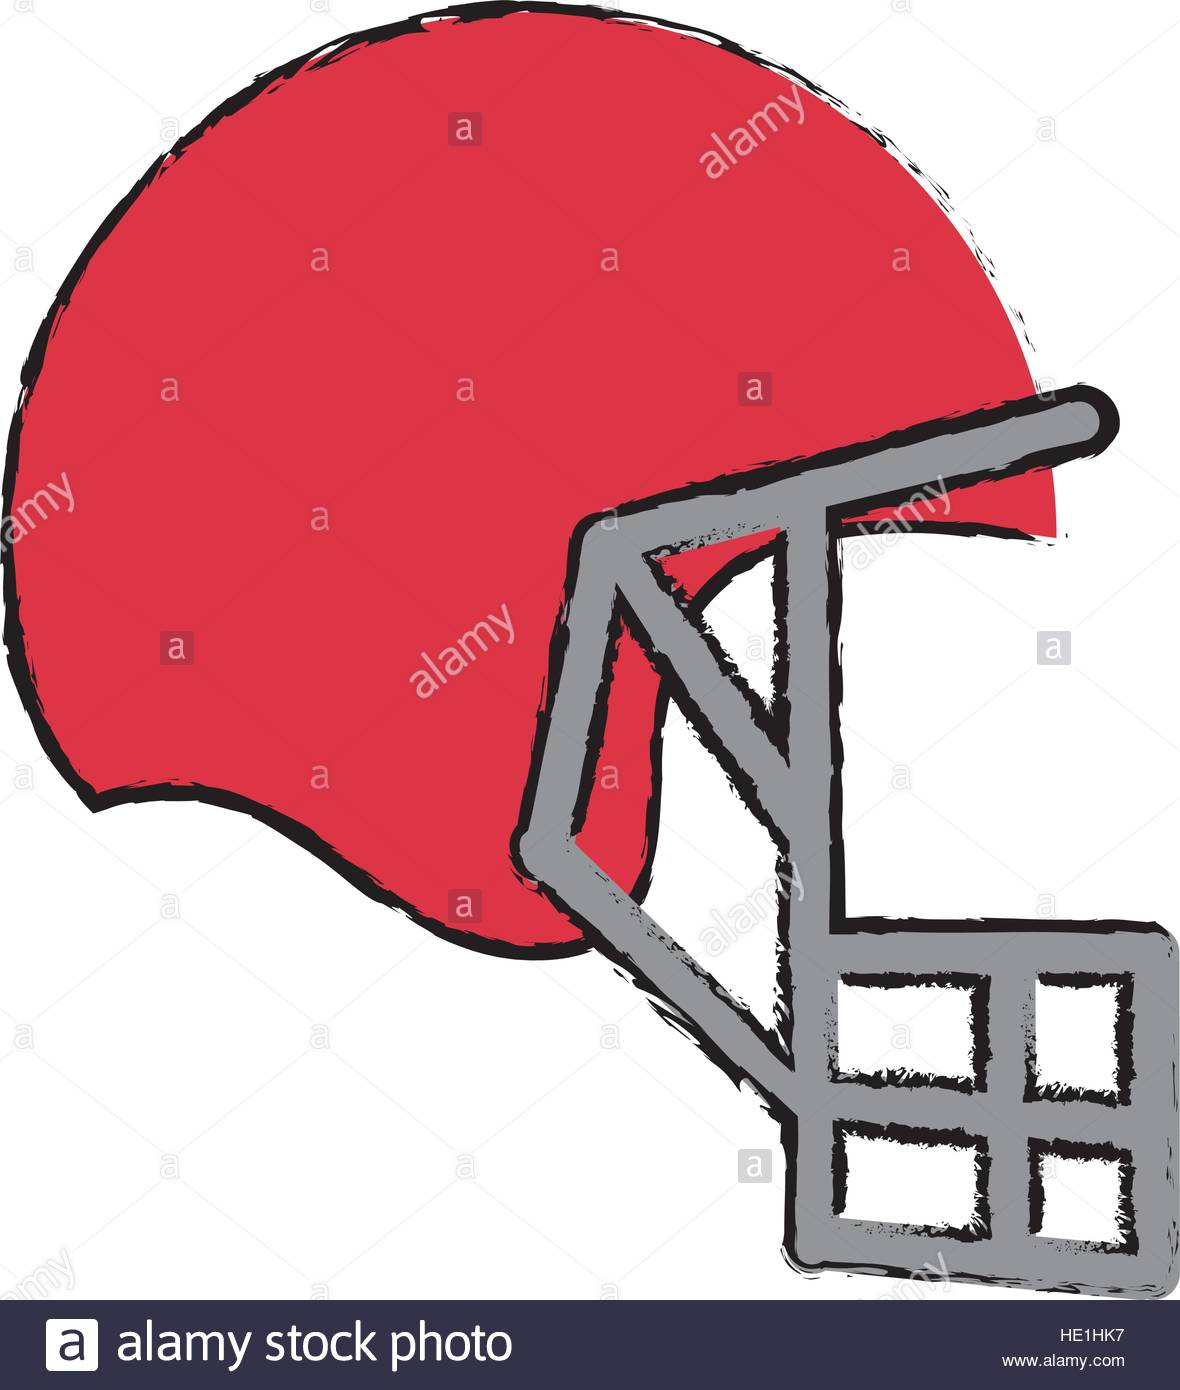 1180x1390 Drawing Helmet Mask American Football Equipment Vector